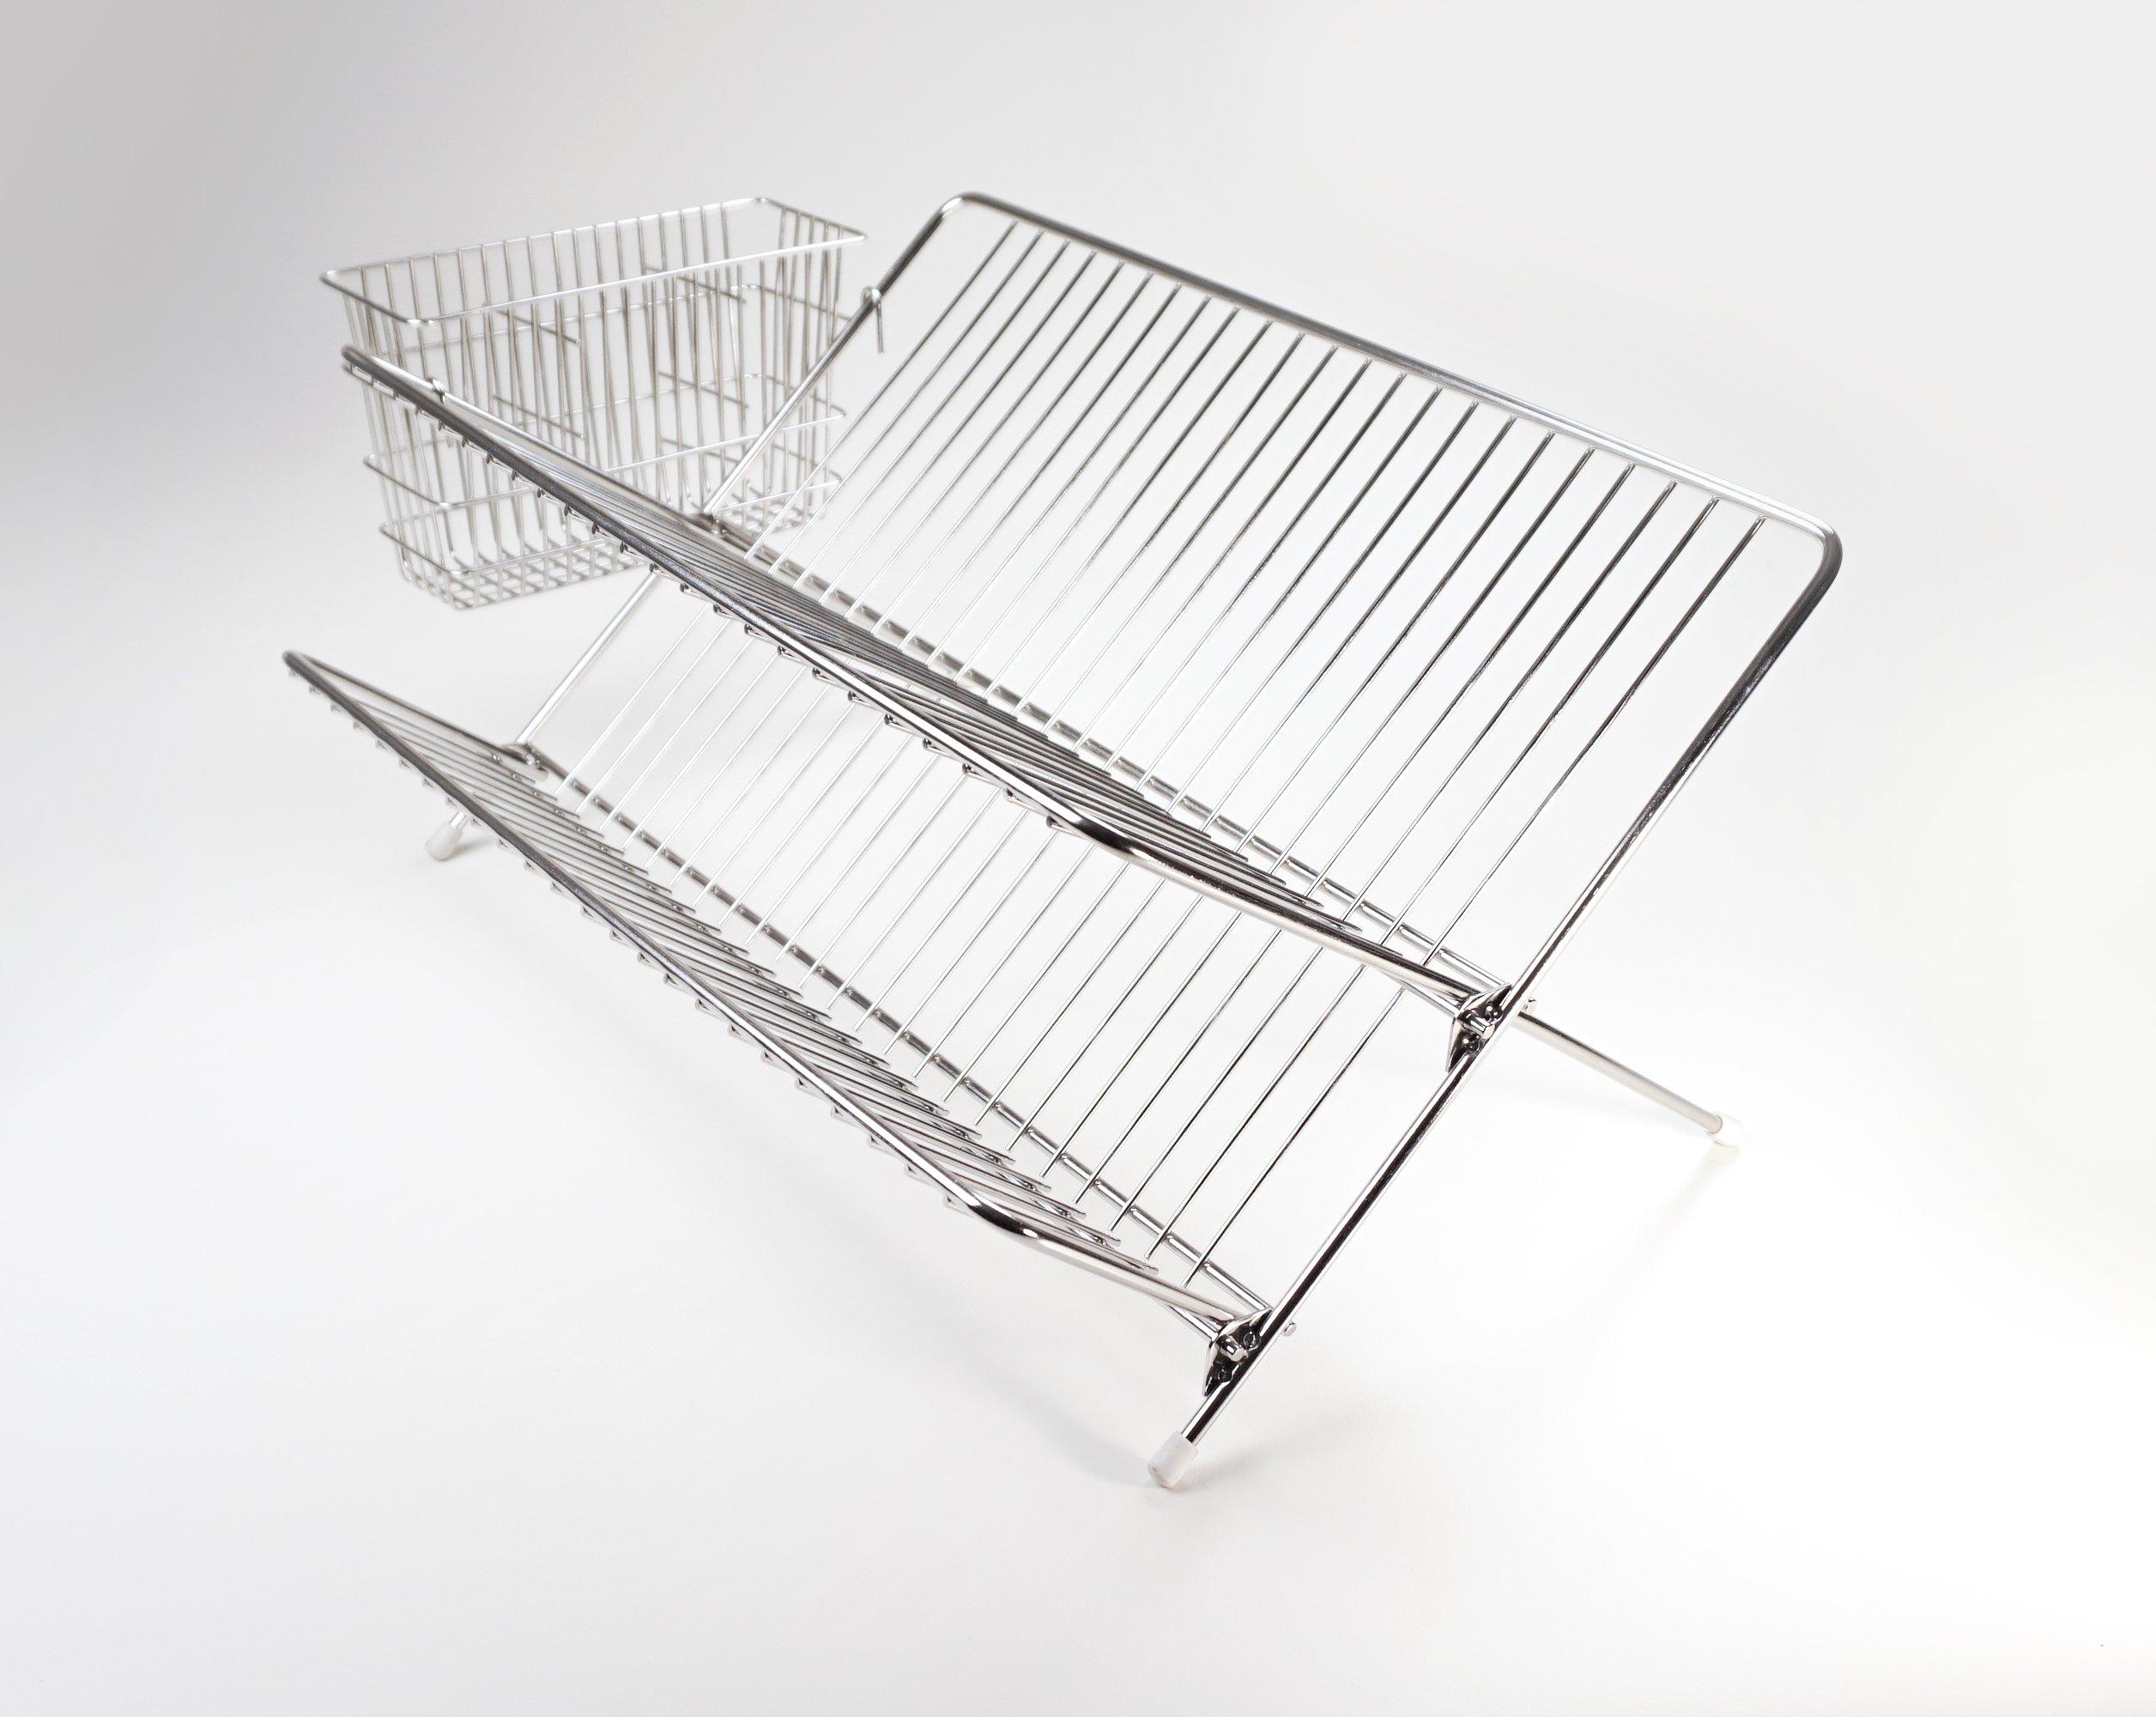 RSVP Endurance Stainless Steel Compact Folding Dish Rack